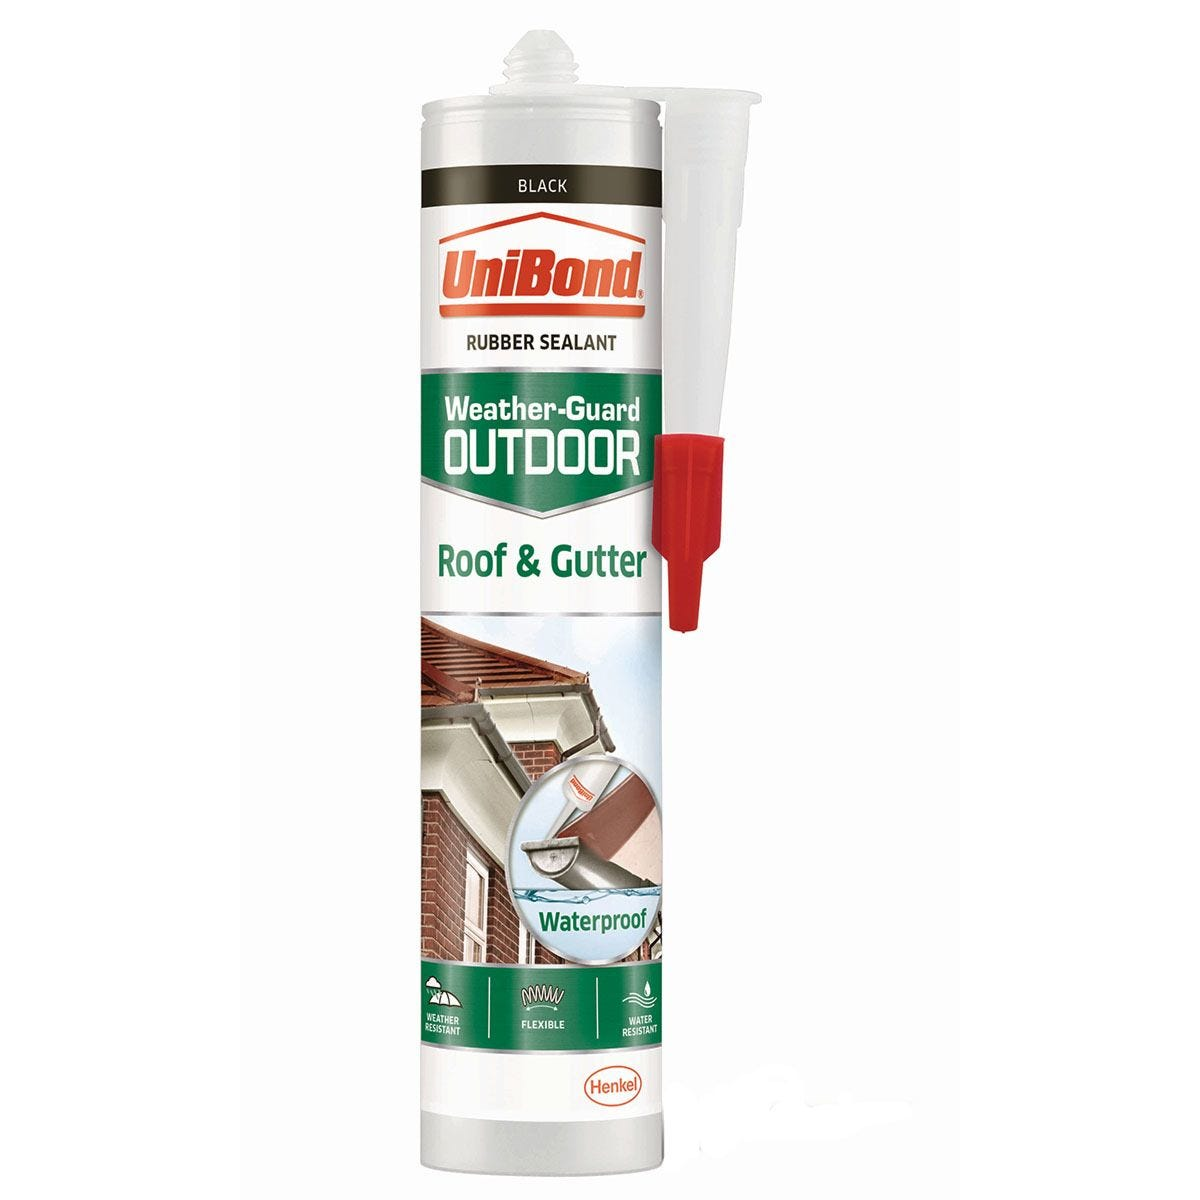 UniBond Roof & Gutter Outdoor Sealant - Black